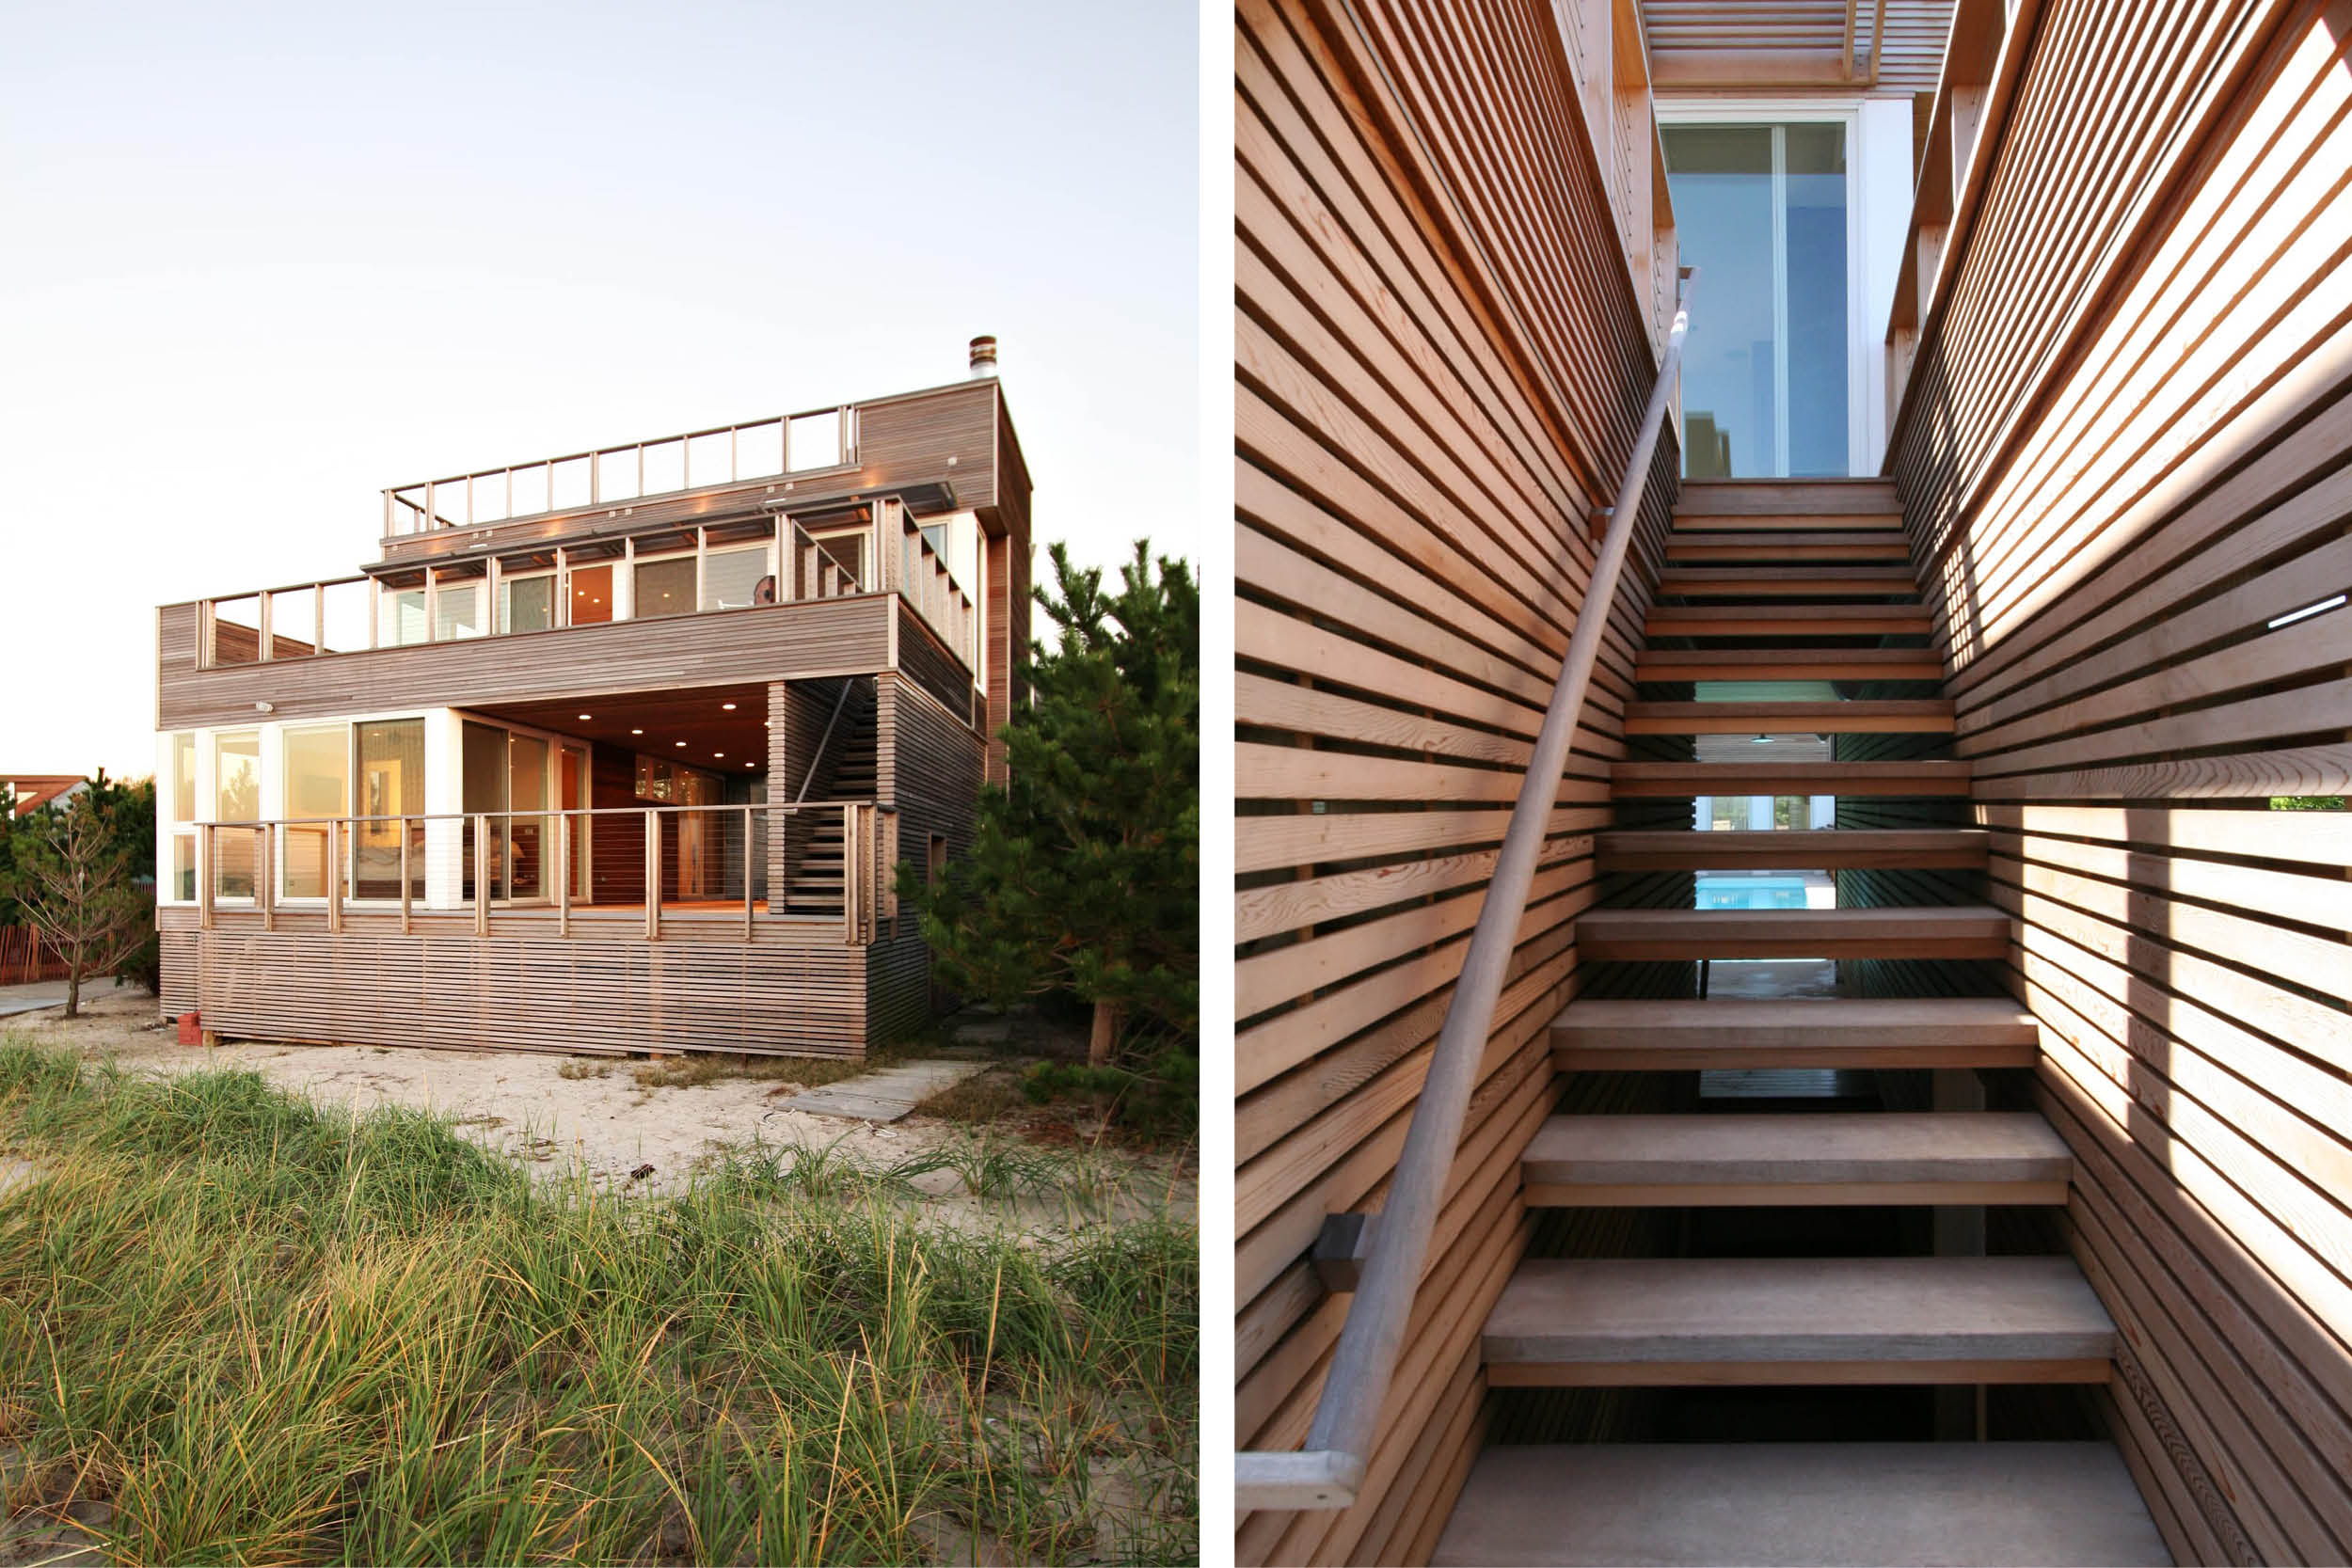 Modern Modular Prefab House | Cedar siding Beach White Windows Open Tread Stair Screen Wall | Fire Island New York | RES4